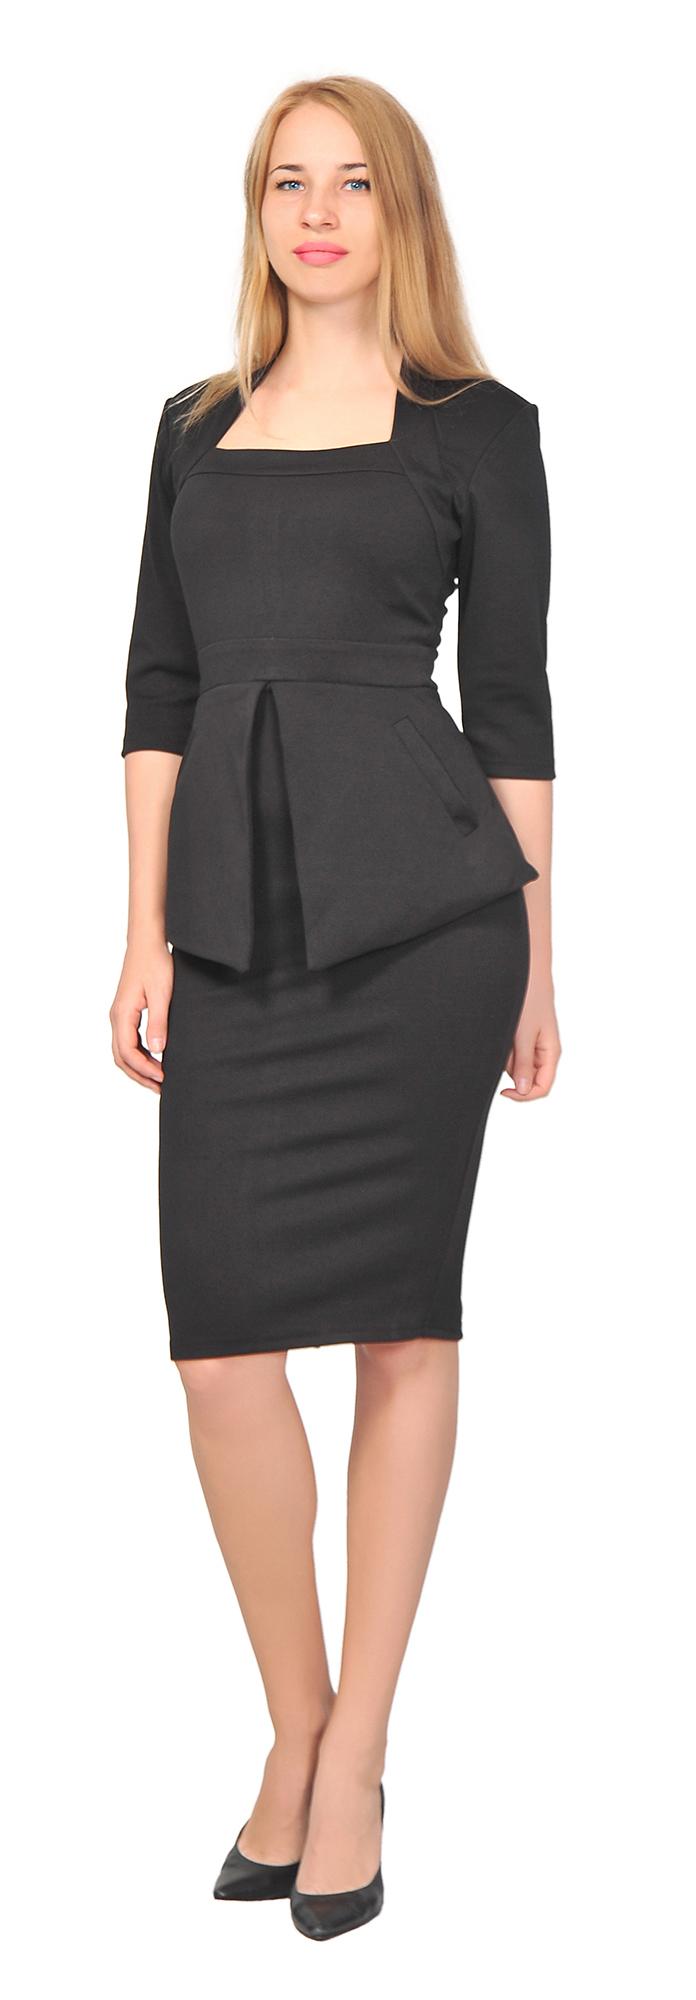 WOMEN'S ELEGANT PEPLUM DRESS WORK OFFICE VINTAGE PENCIL ...